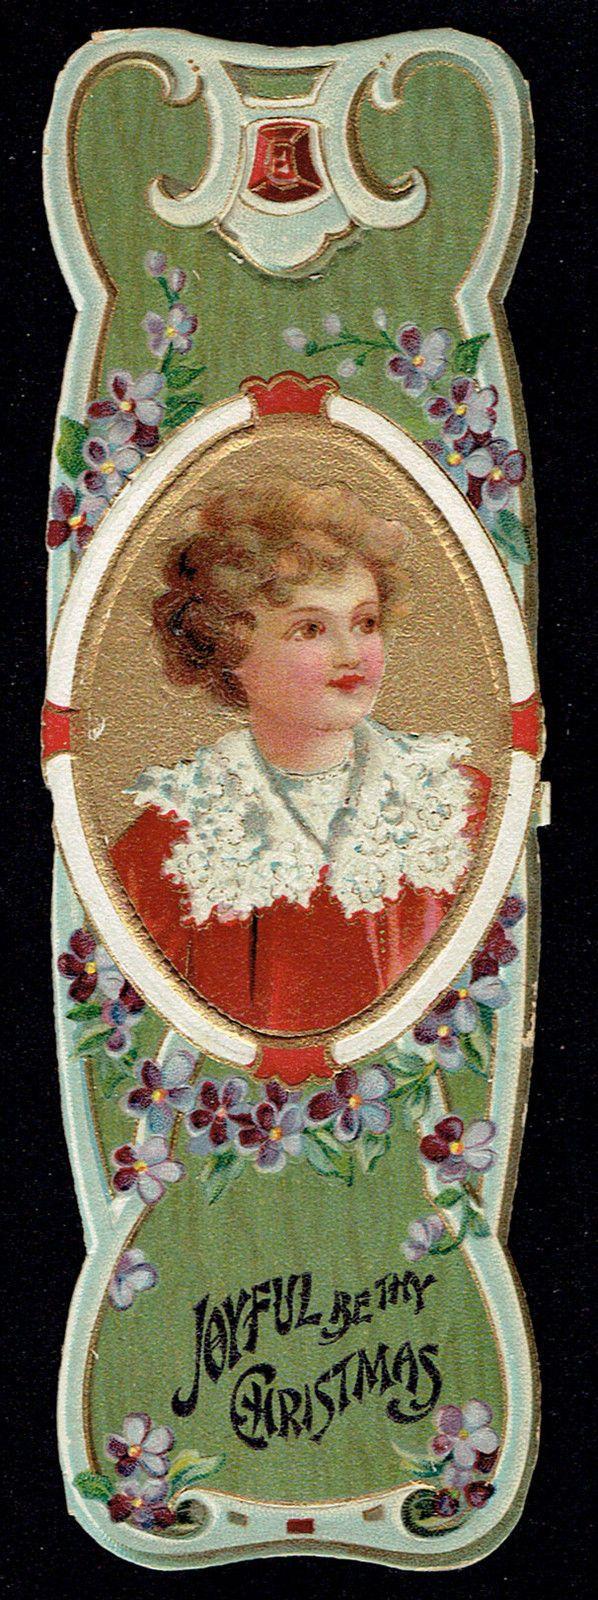 Joyful Christmas Greetings~Ellen Clapsaddle Illustration~Pansies~Ruby~Bookmark | eBay